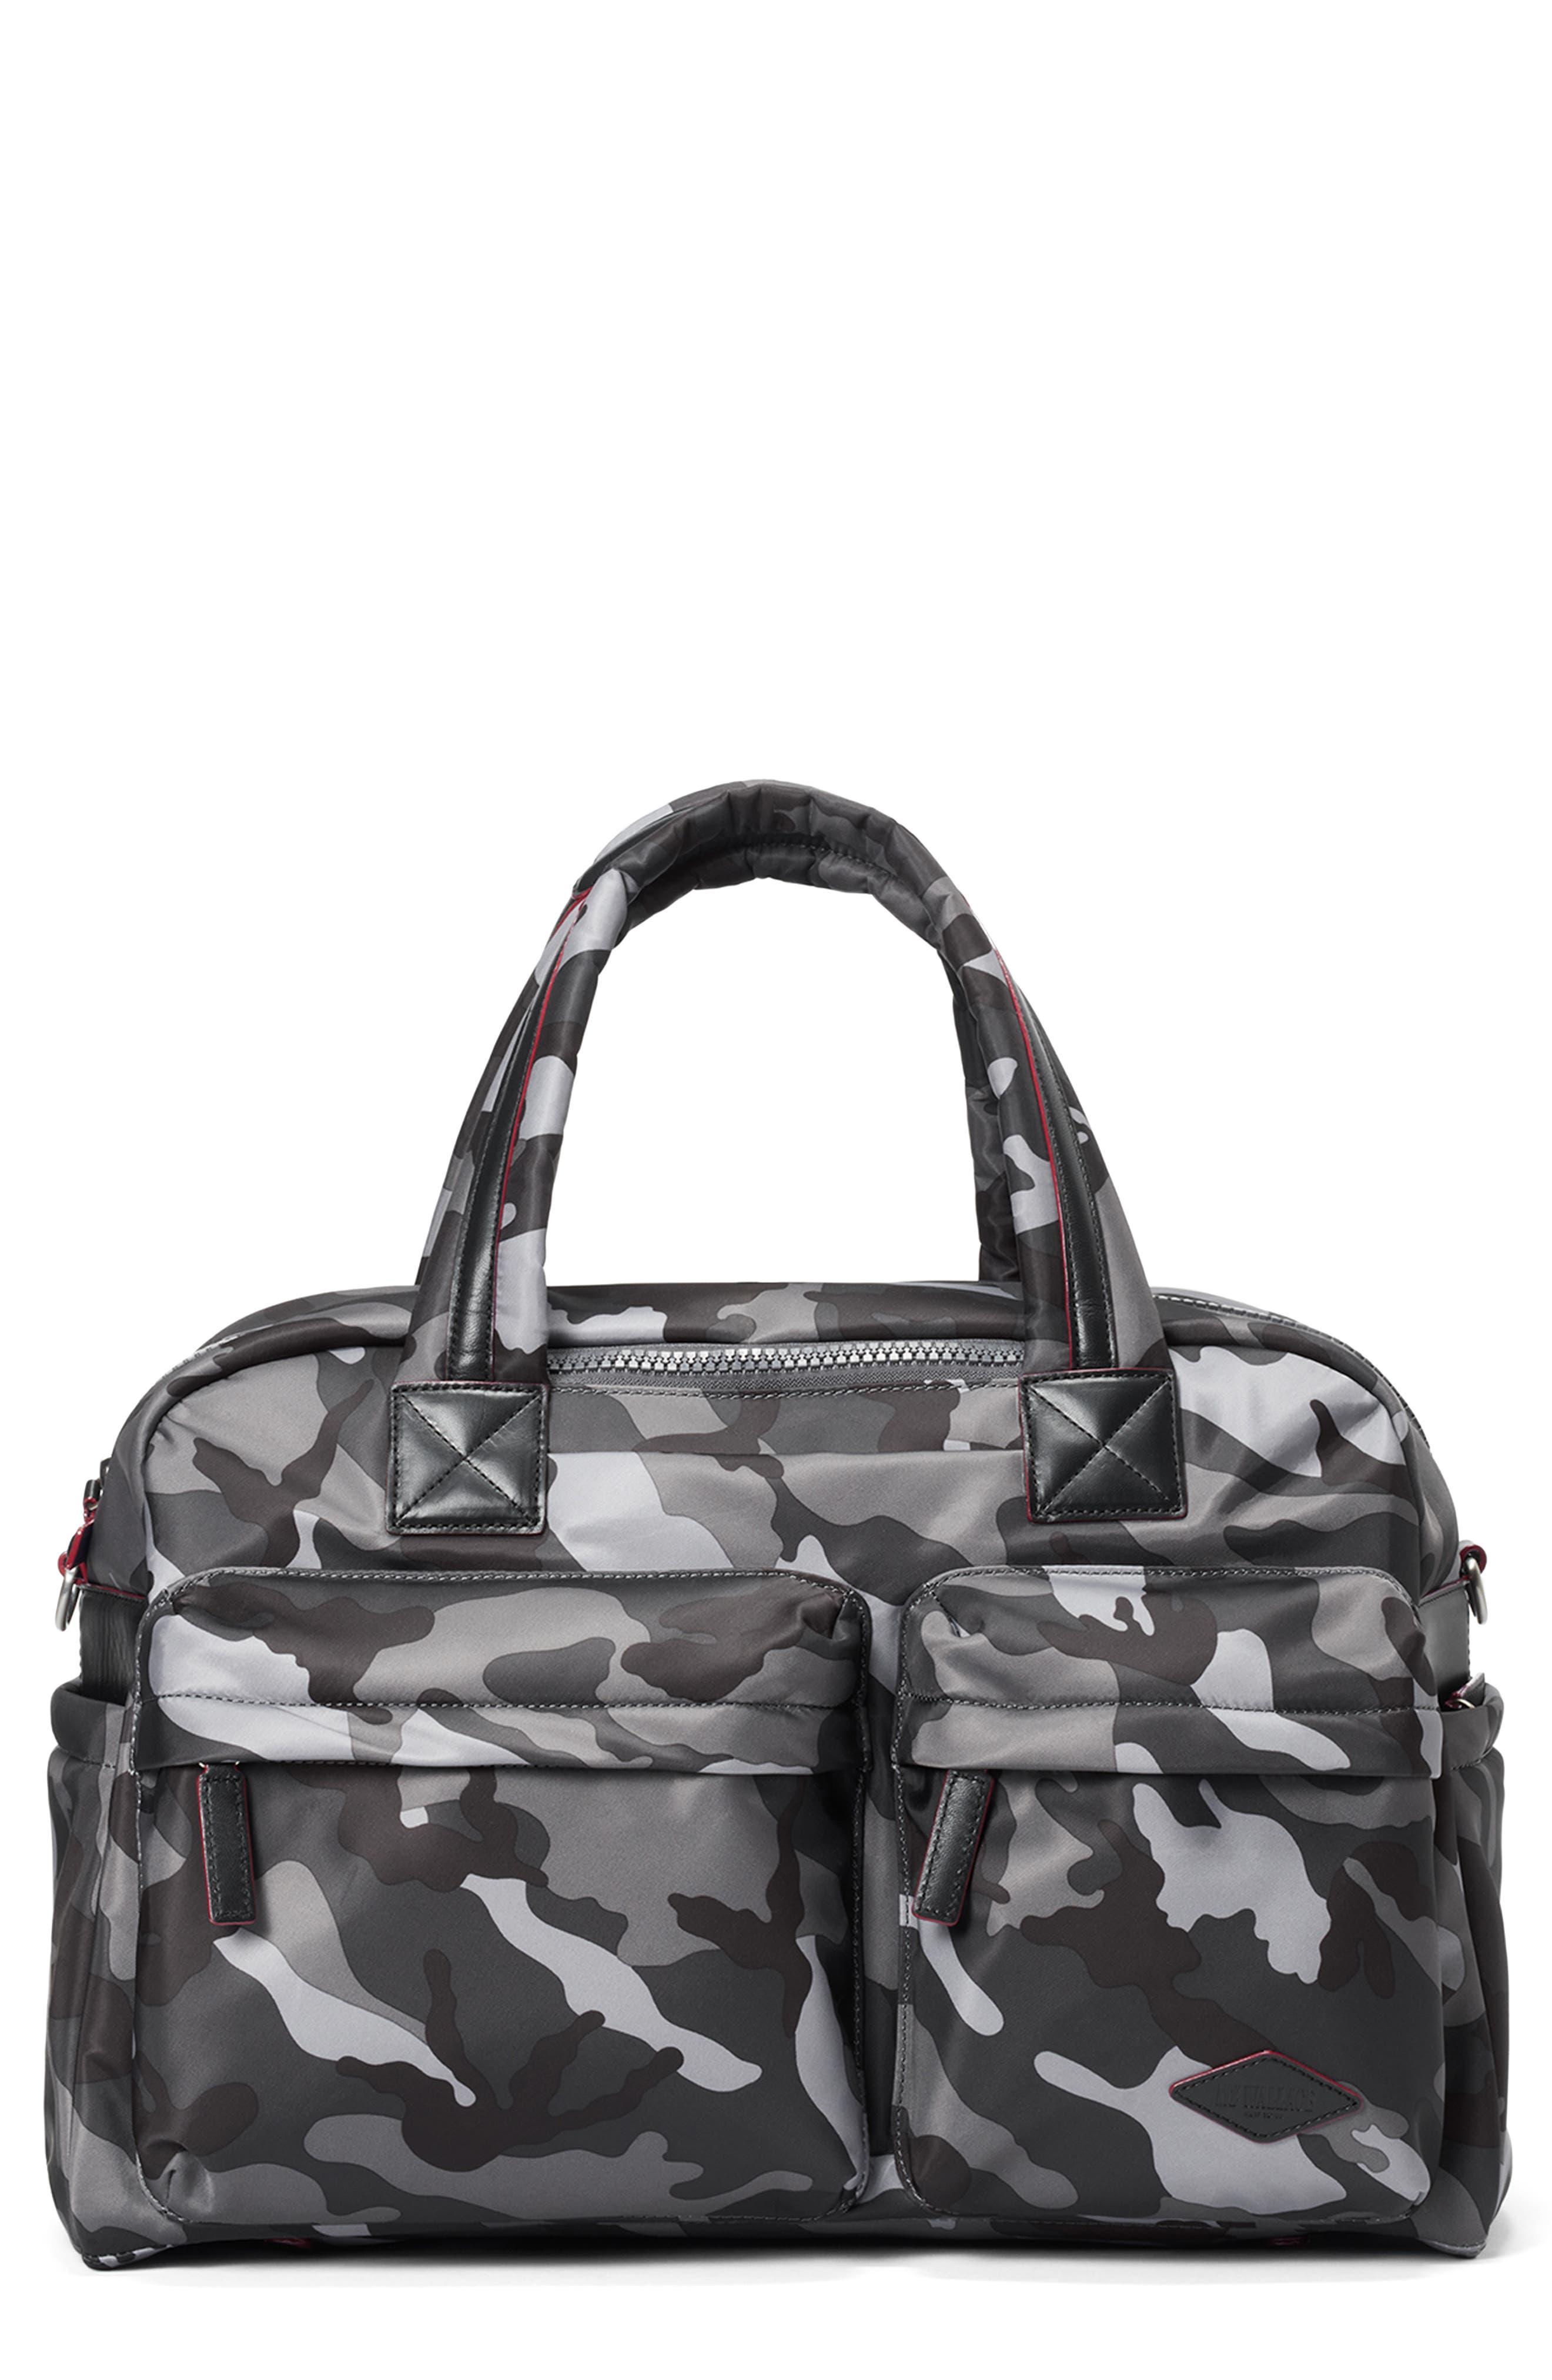 Bleecker Travel Nylon Duffle Bag